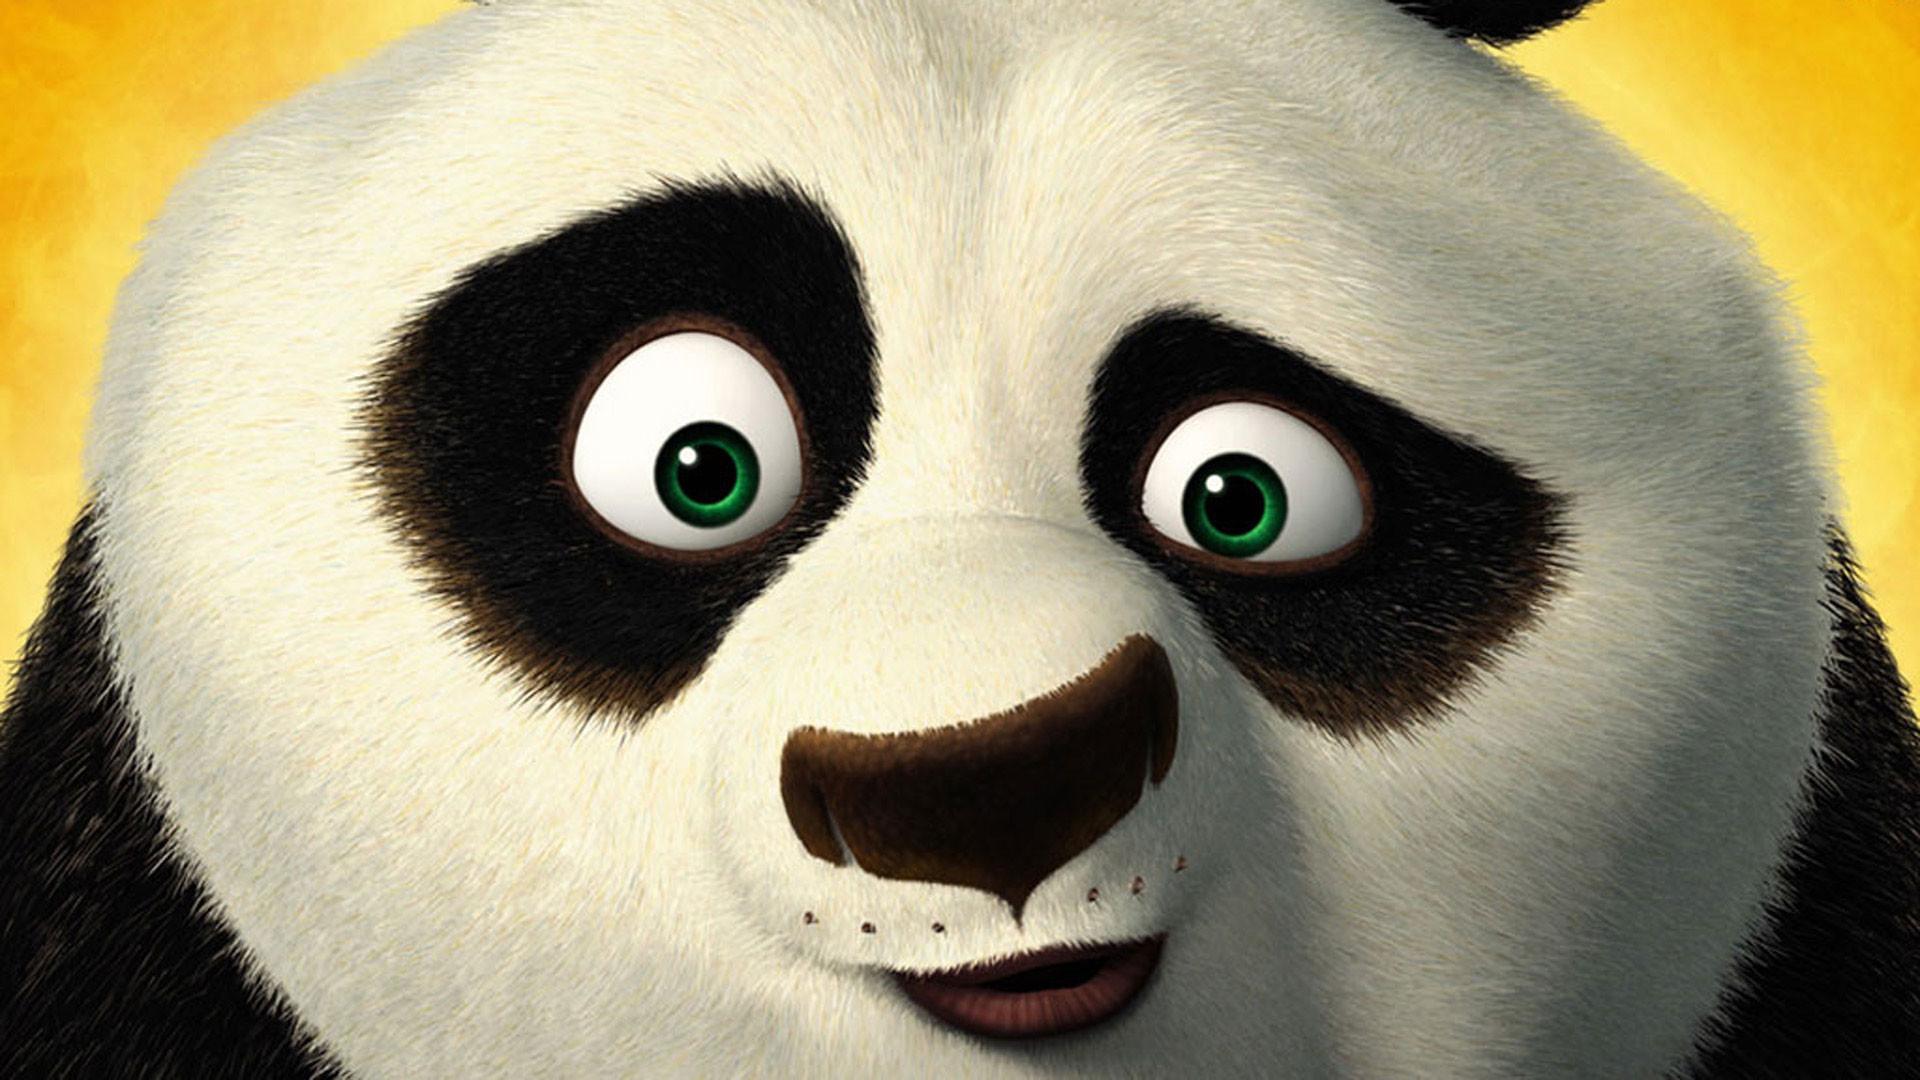 hd pics photos cartoon panda kungfu desktop background wallpaper